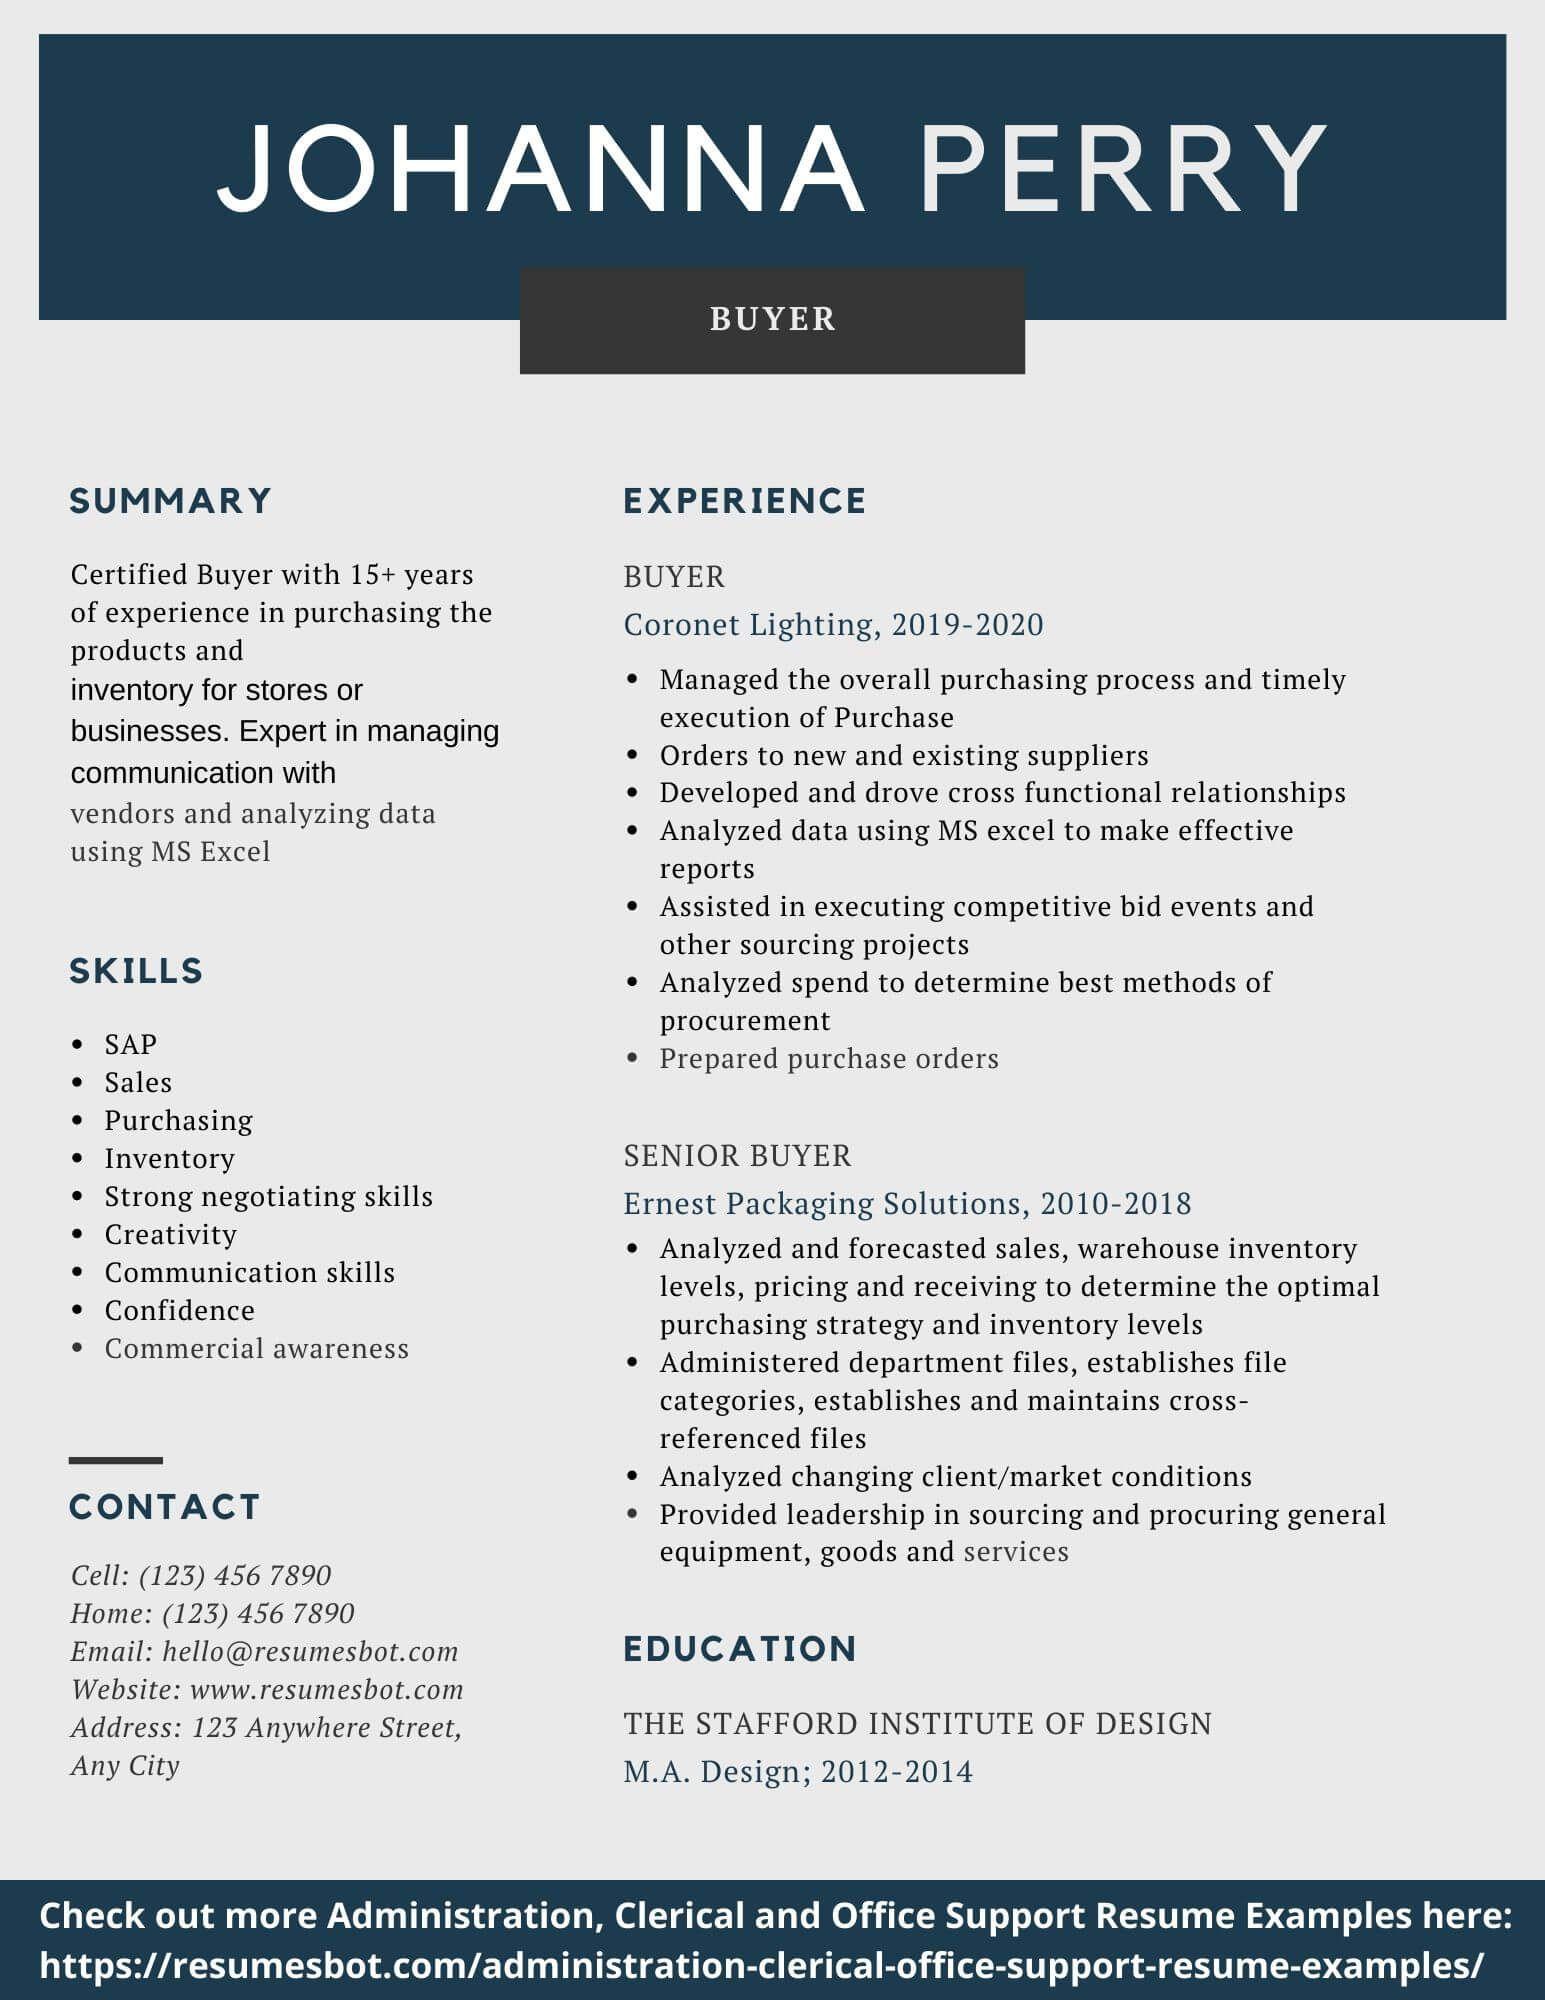 Buyer Resume Samples & Templates [PDF+DOC] 2019 Resume